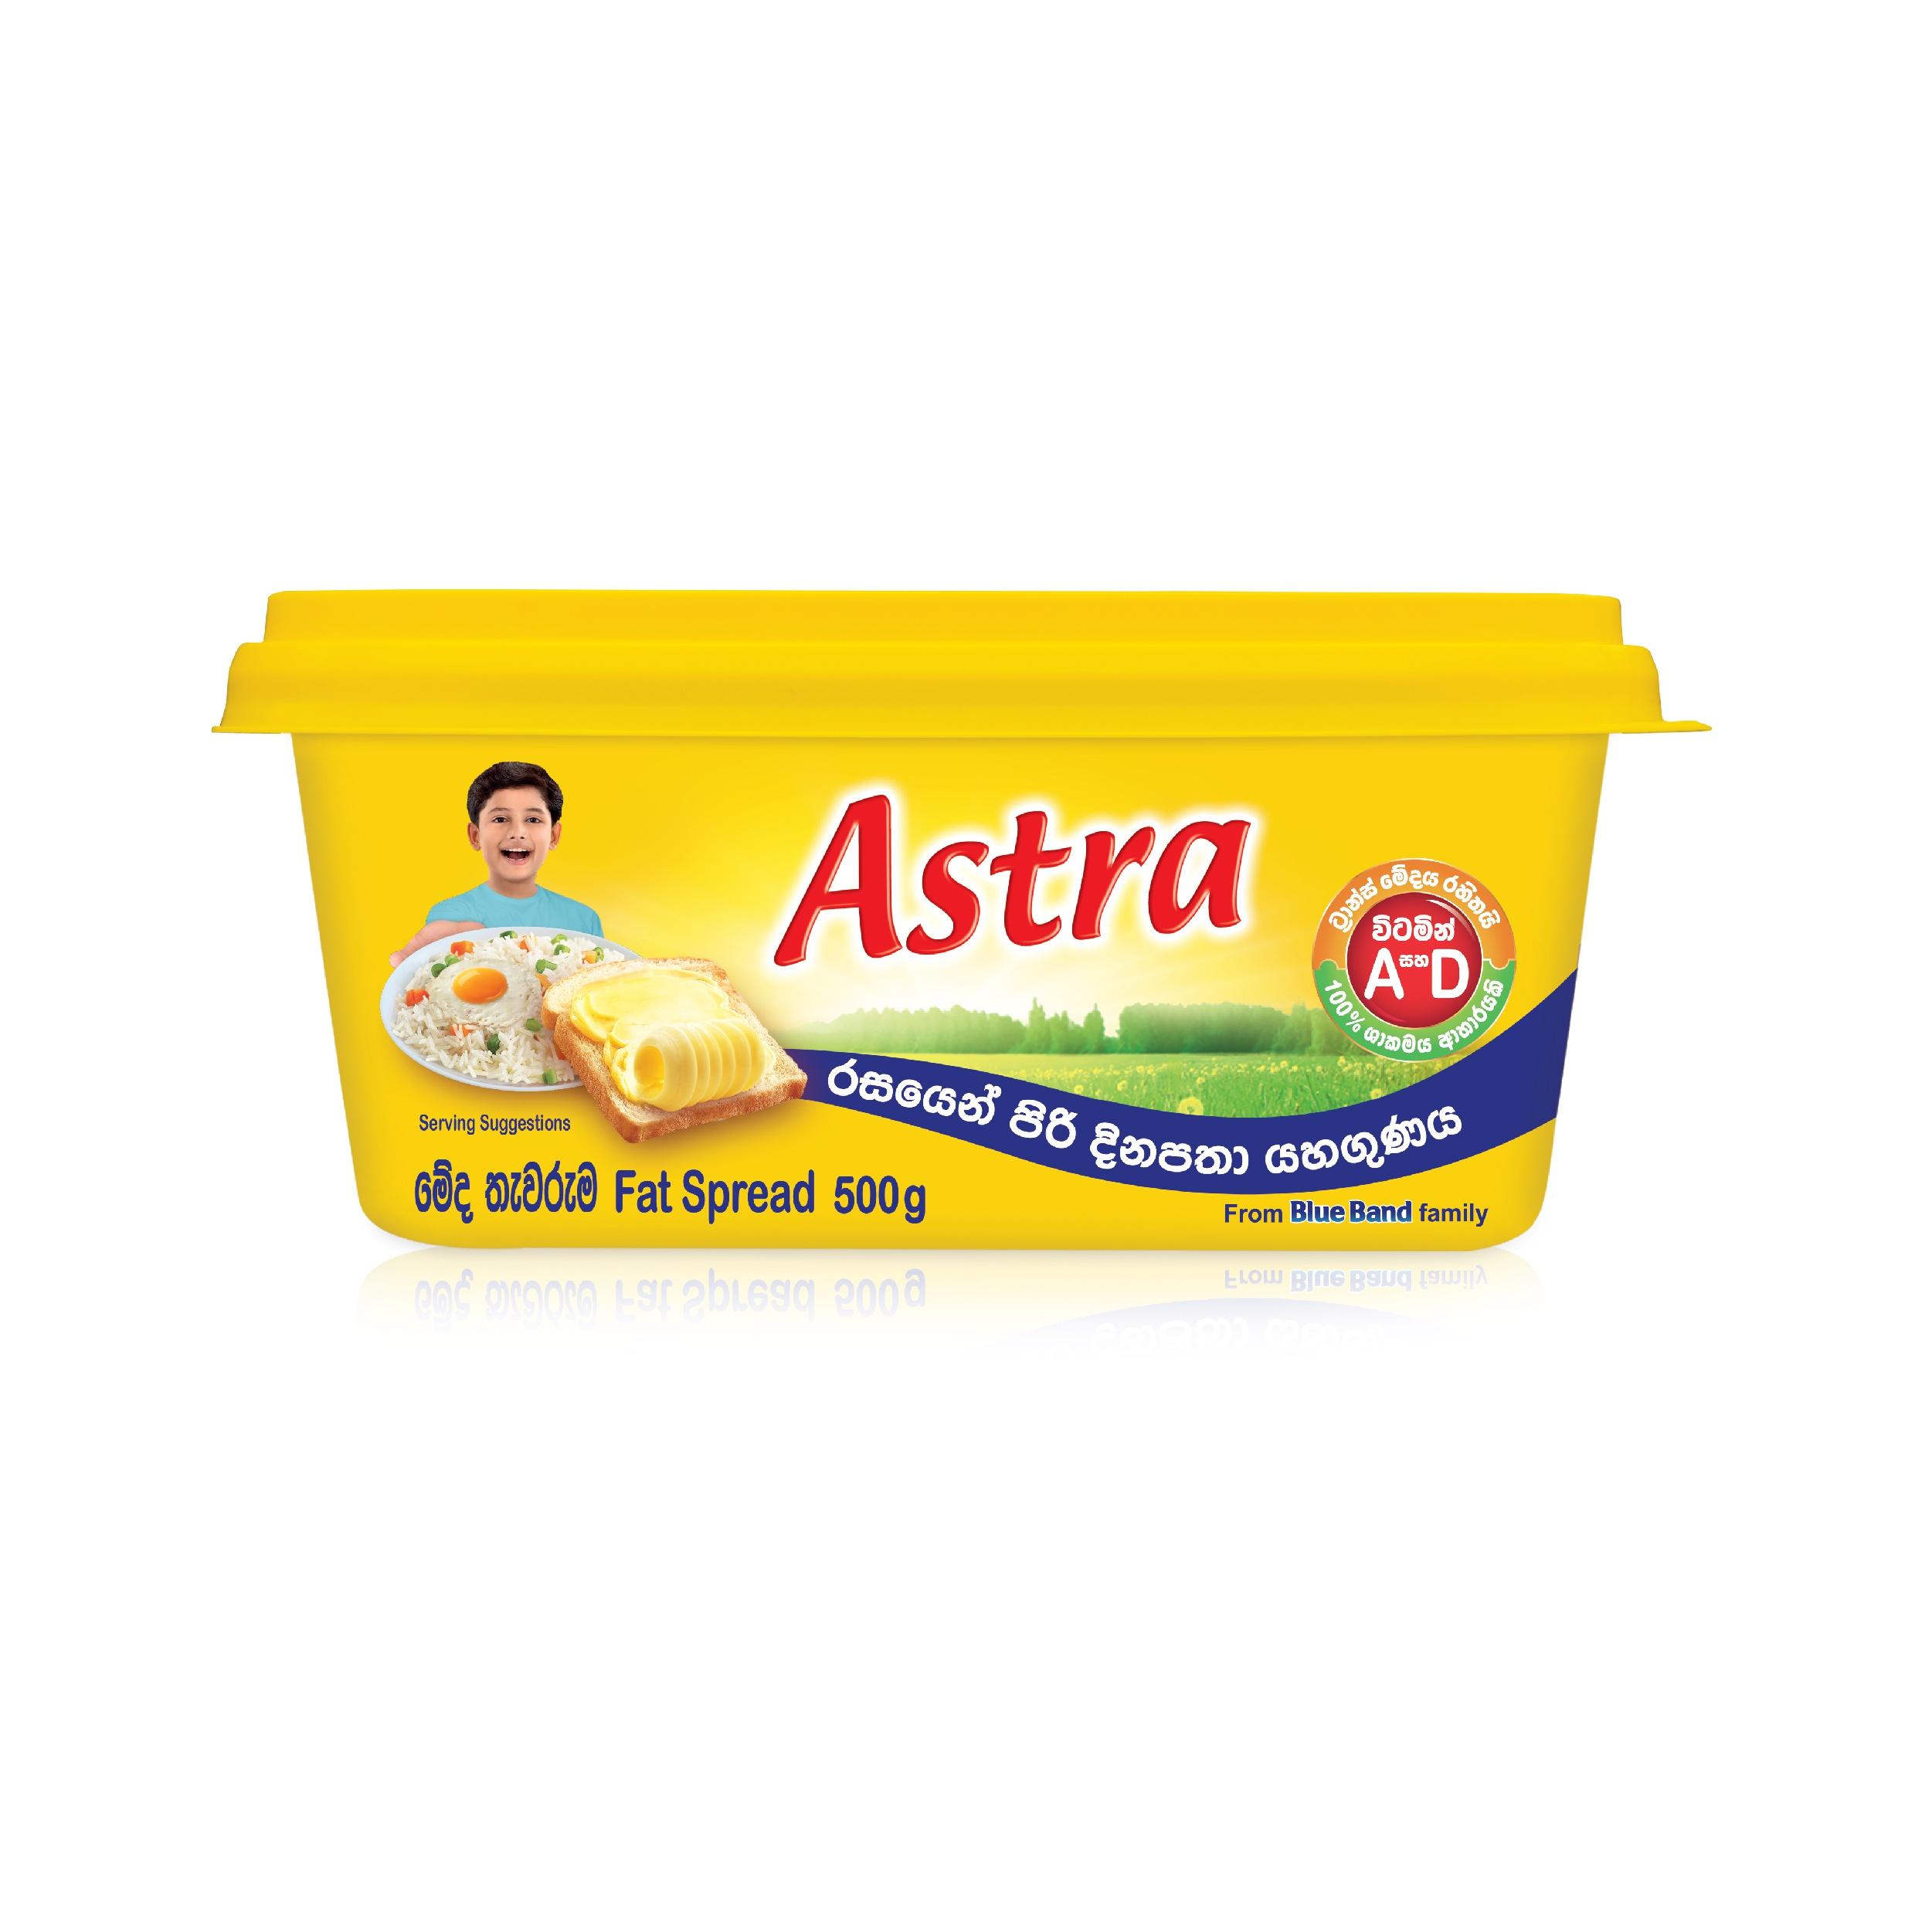 Astra Fat Spread 500G - ASTRA - Spreads - in Sri Lanka